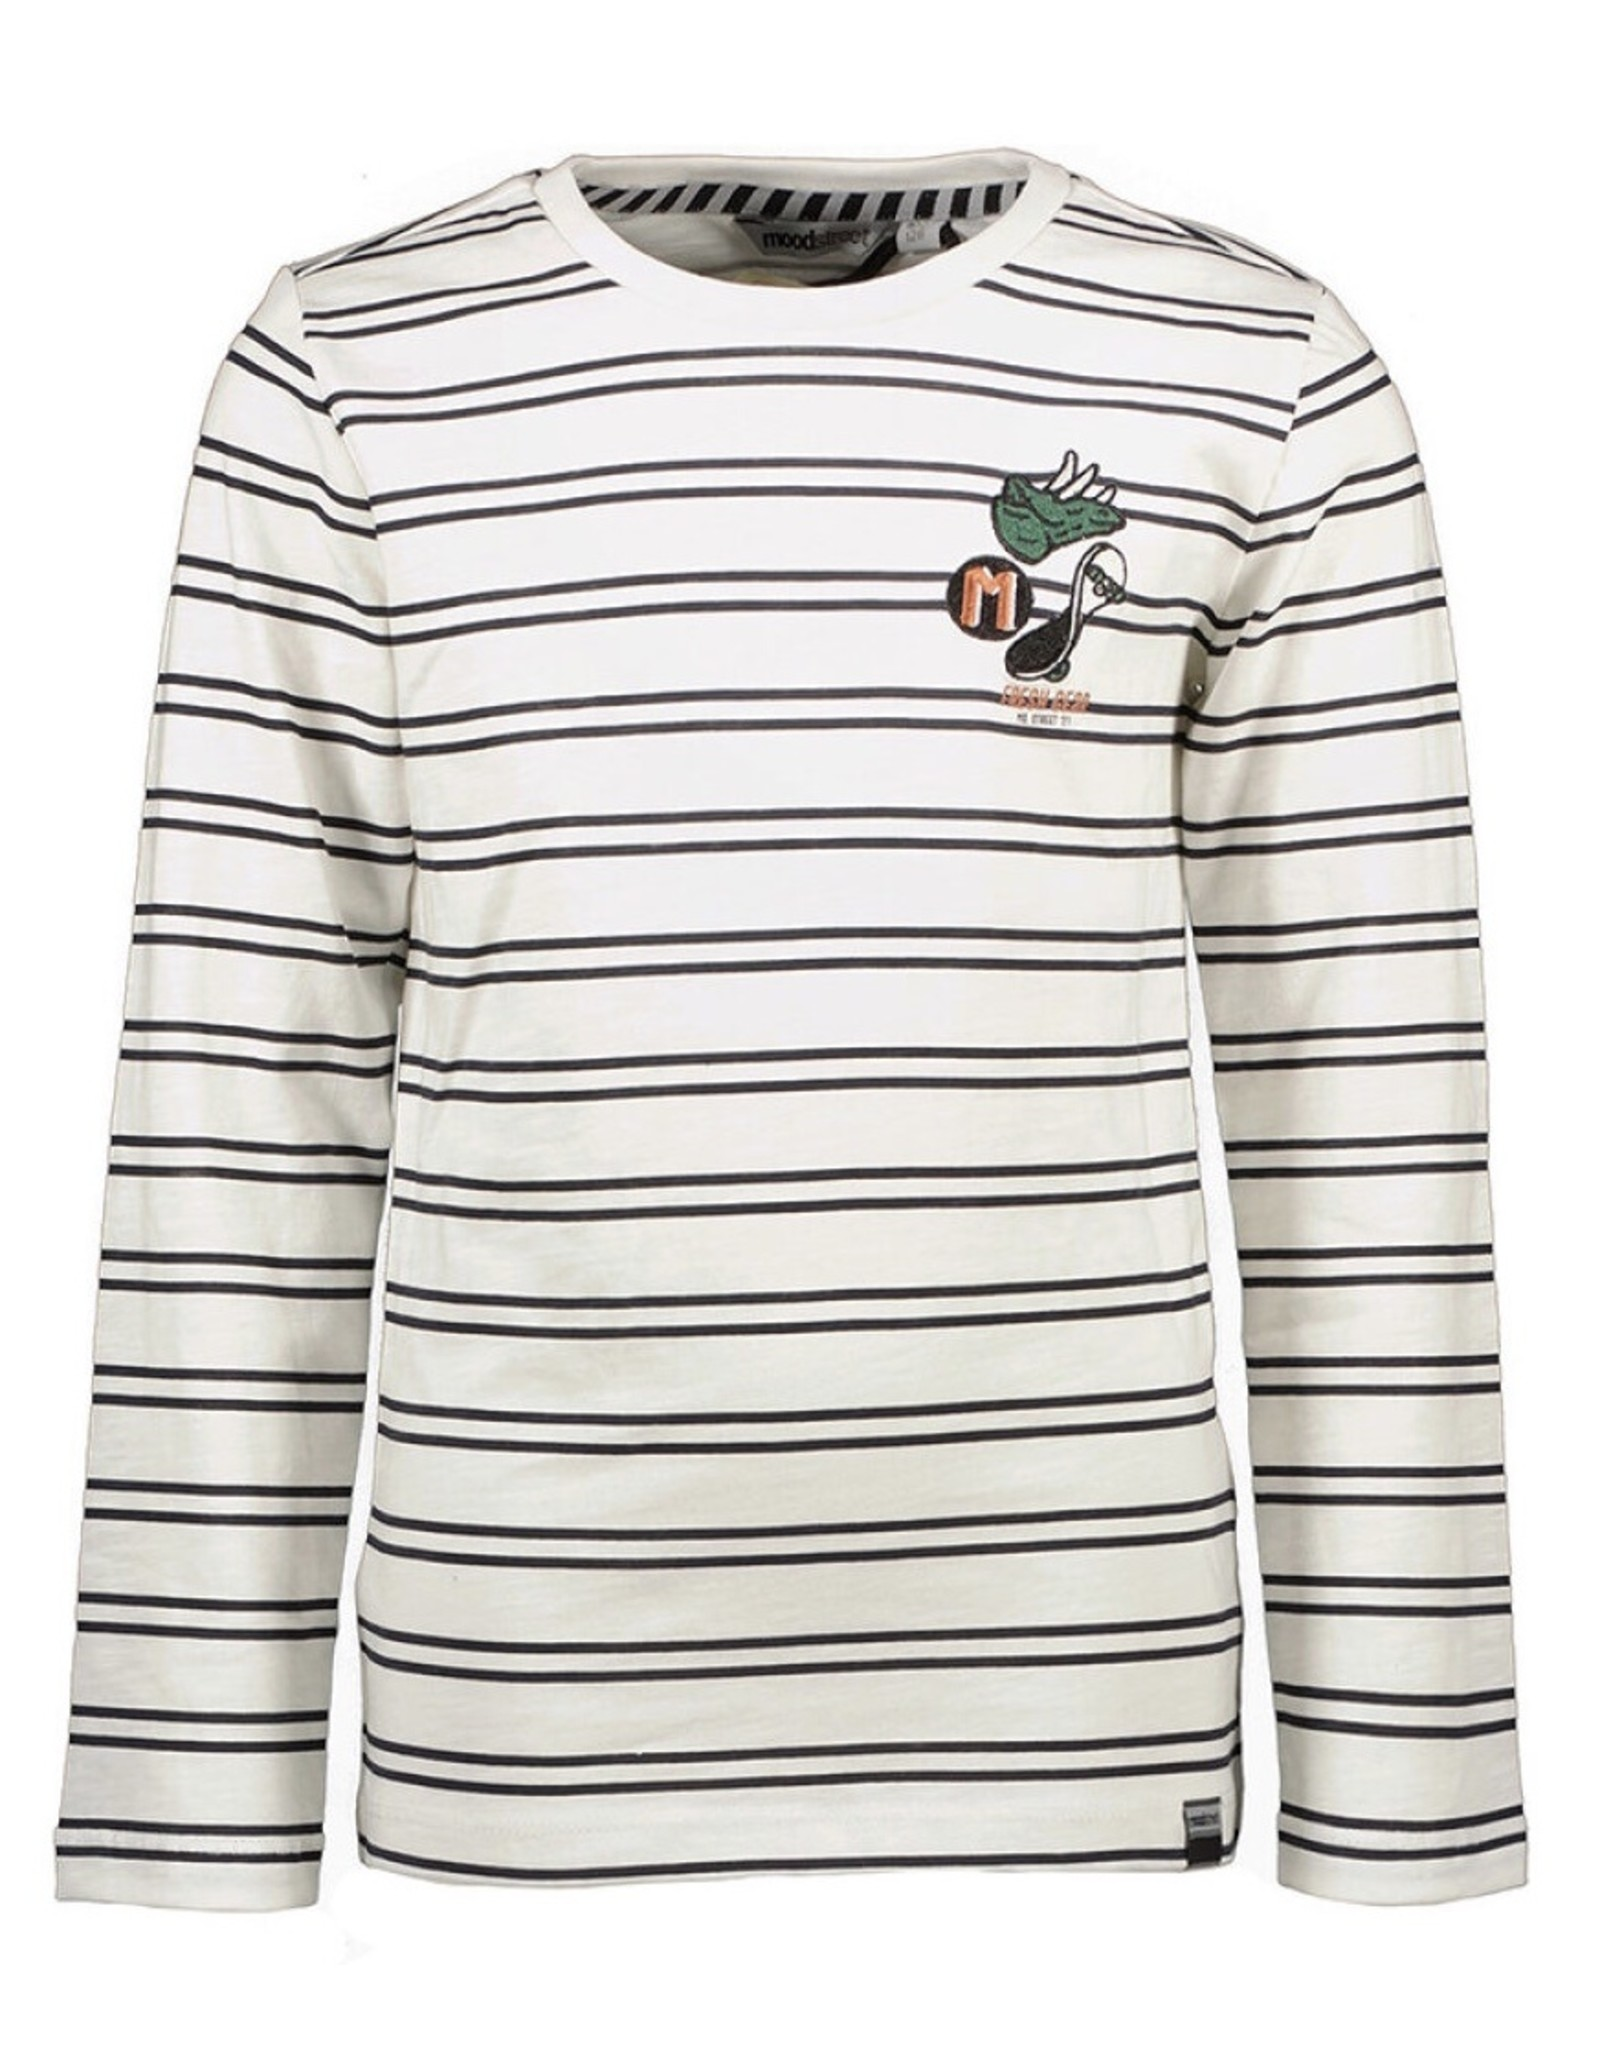 moodstreet M108-6446 T-Shirt